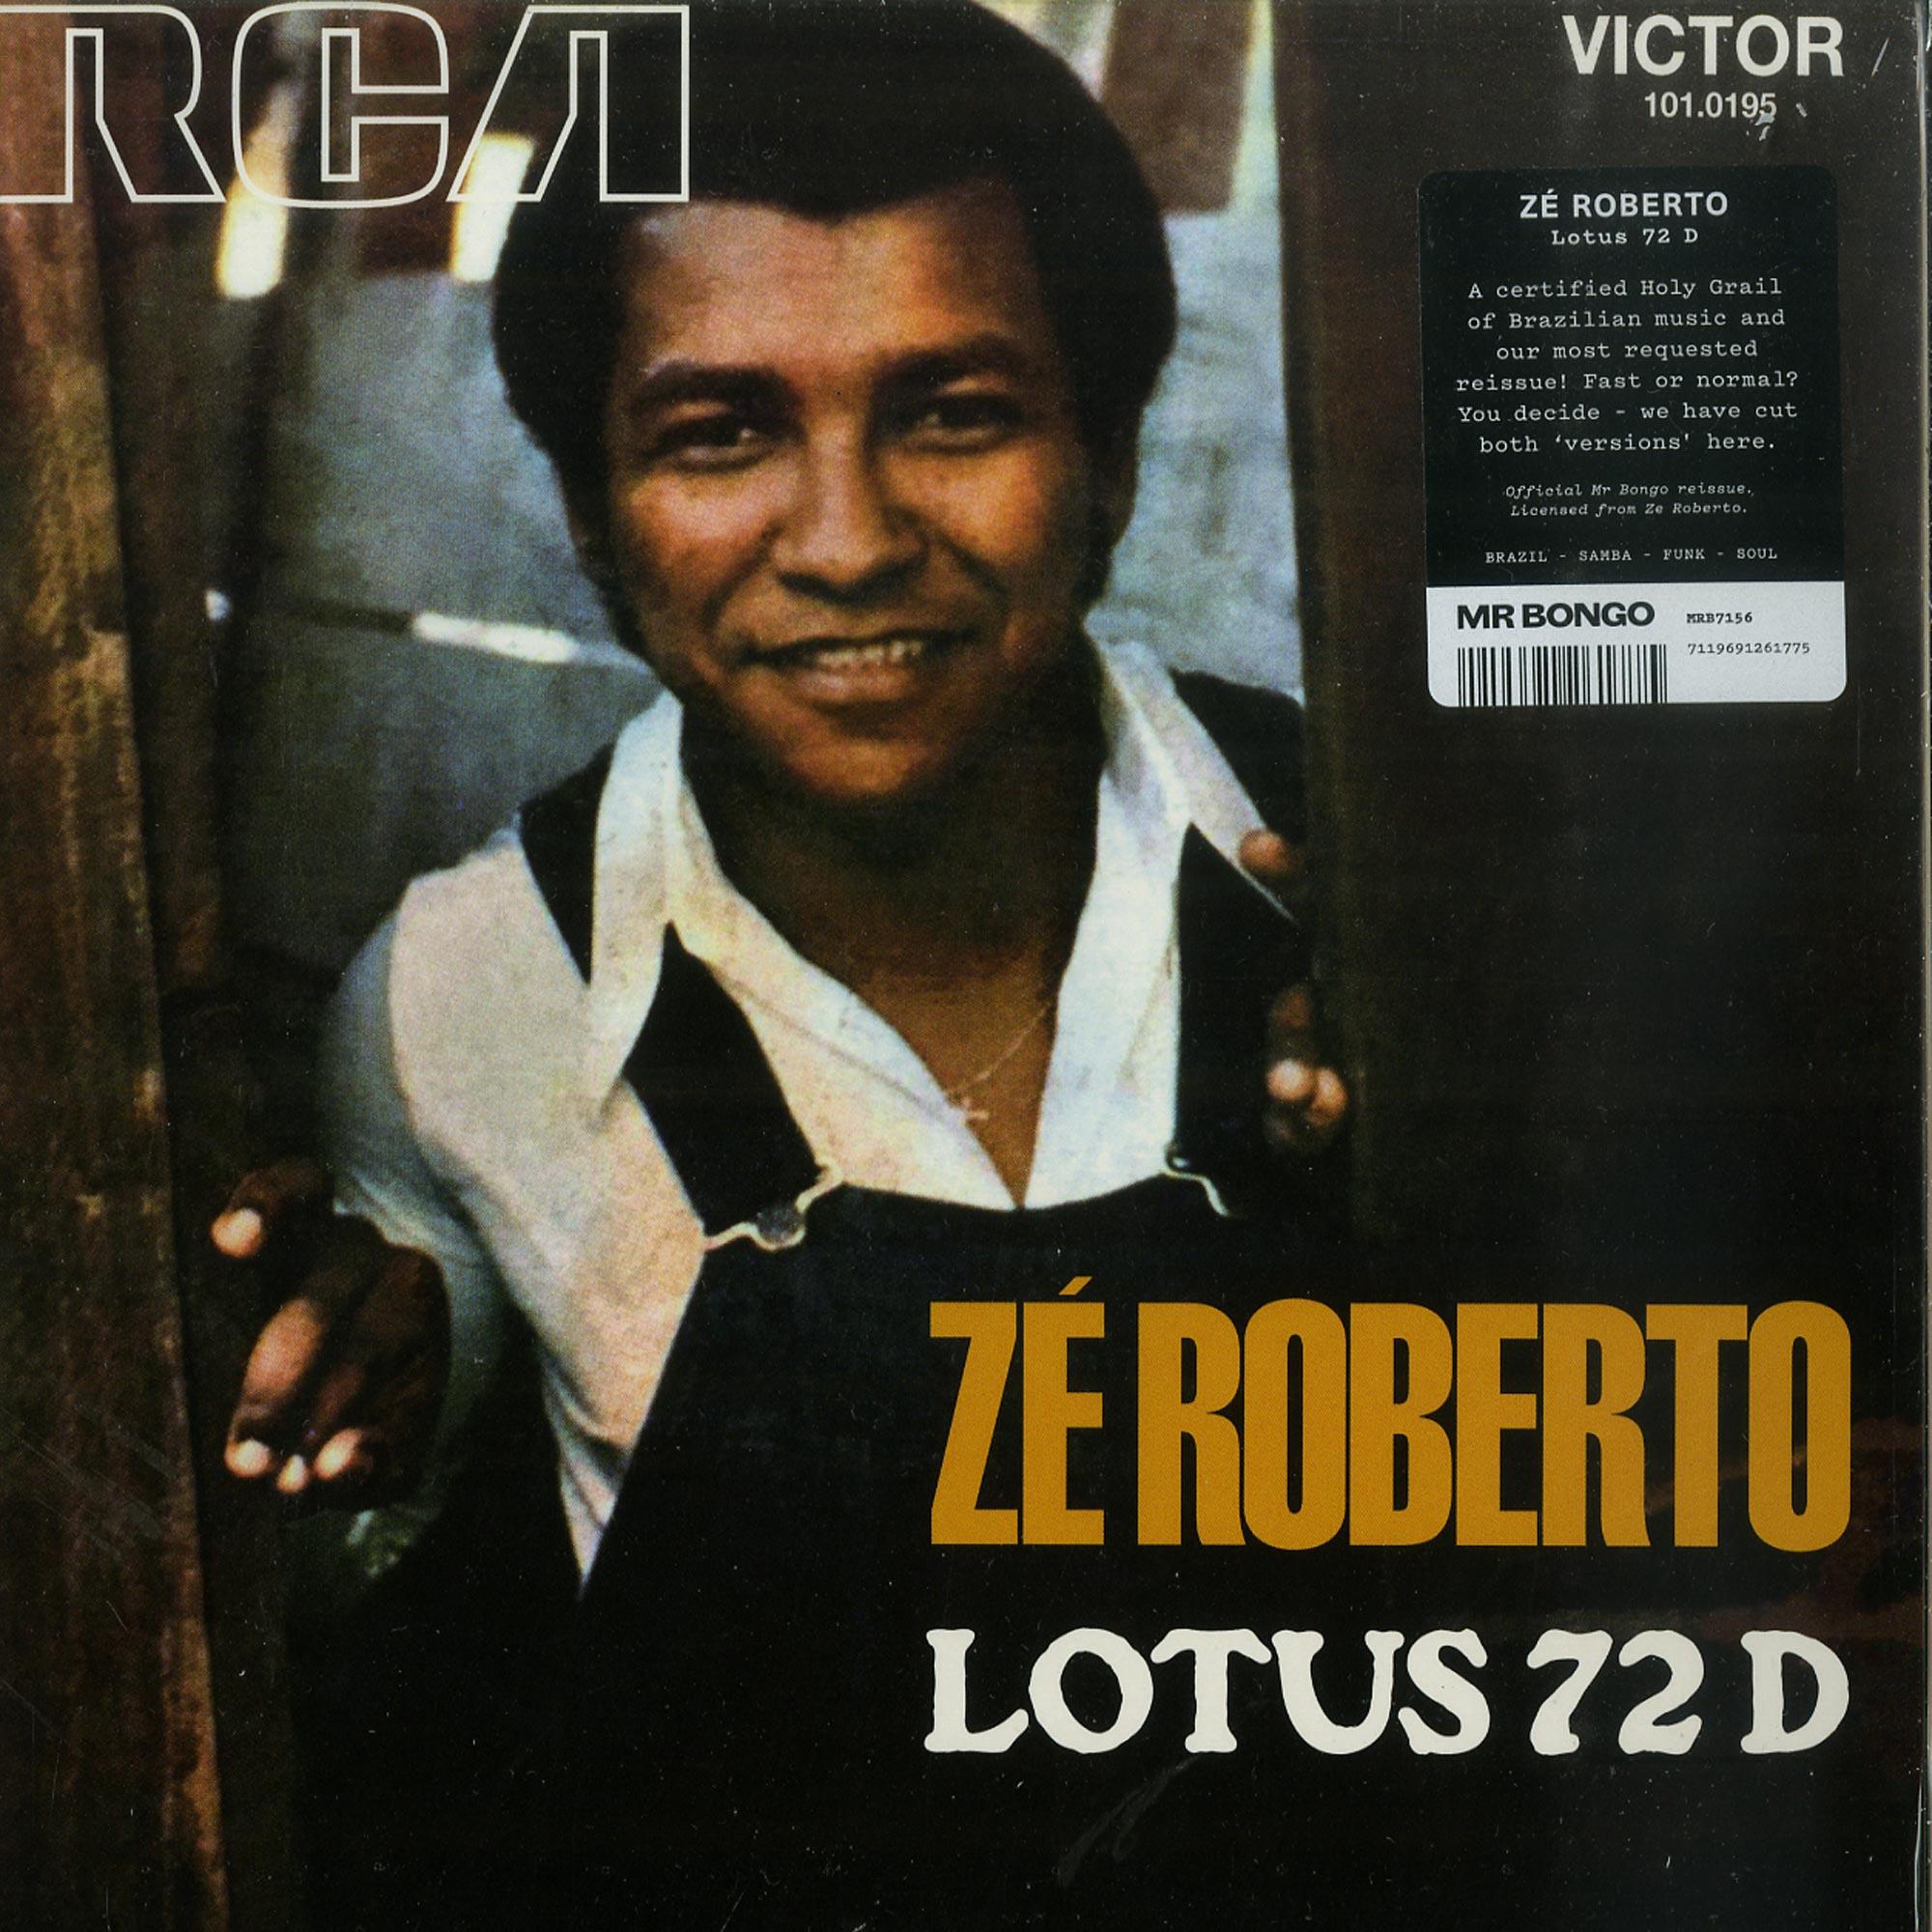 Ze Roberto - LOTUS 72 D